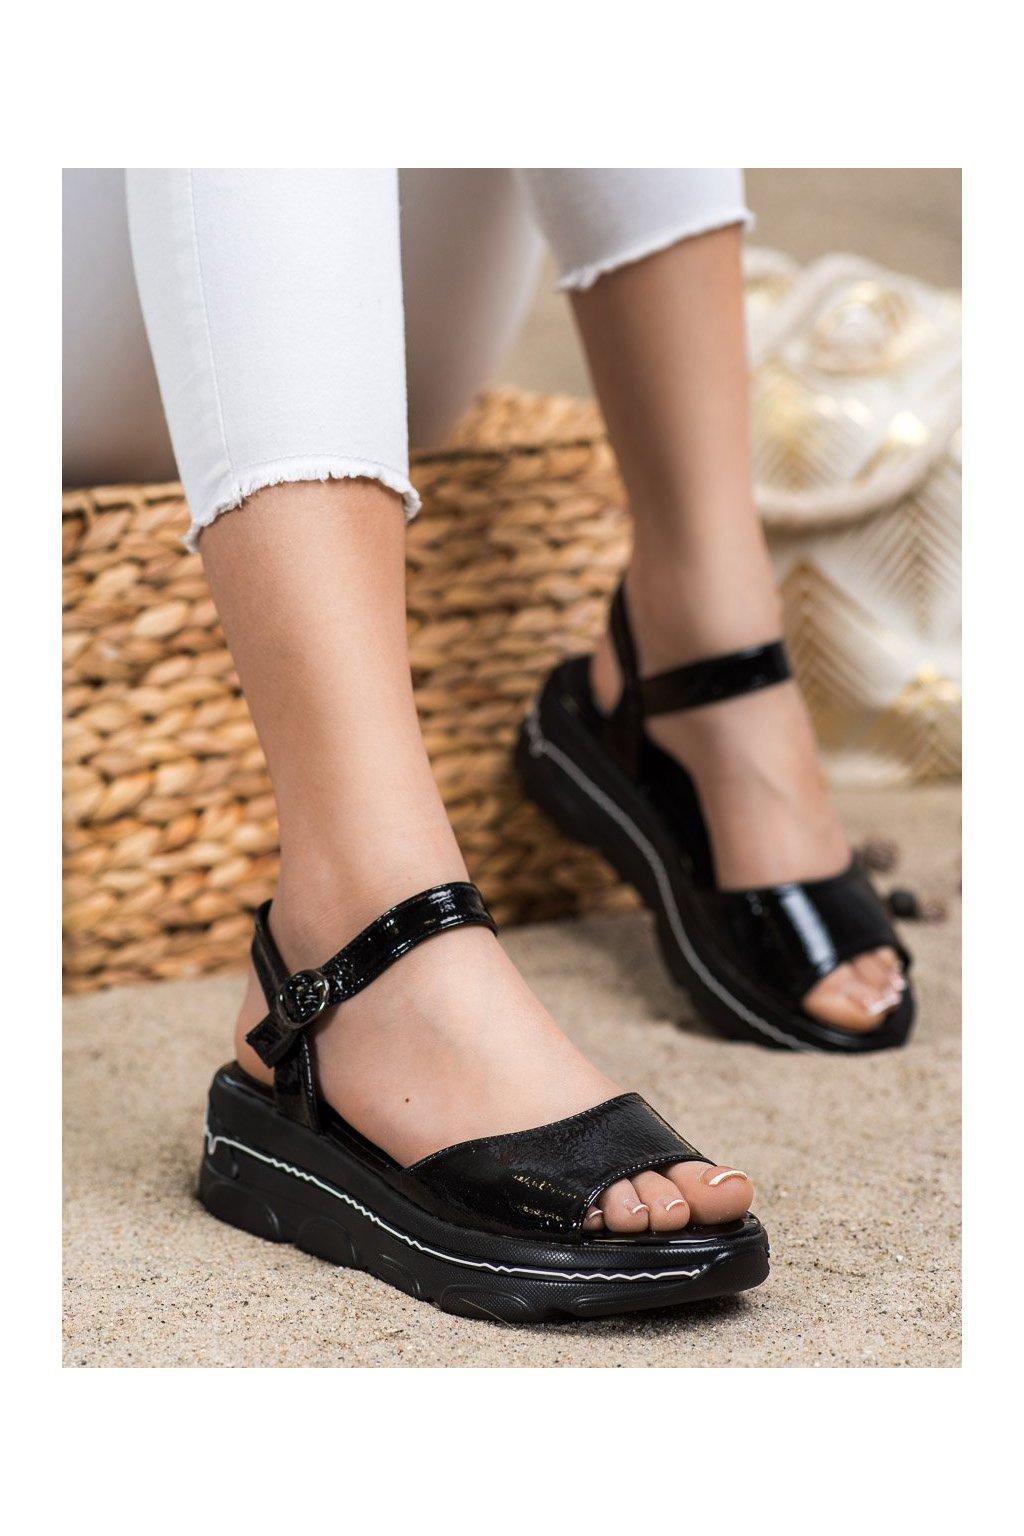 Čierne sandále Filippo kod DS2319/21B